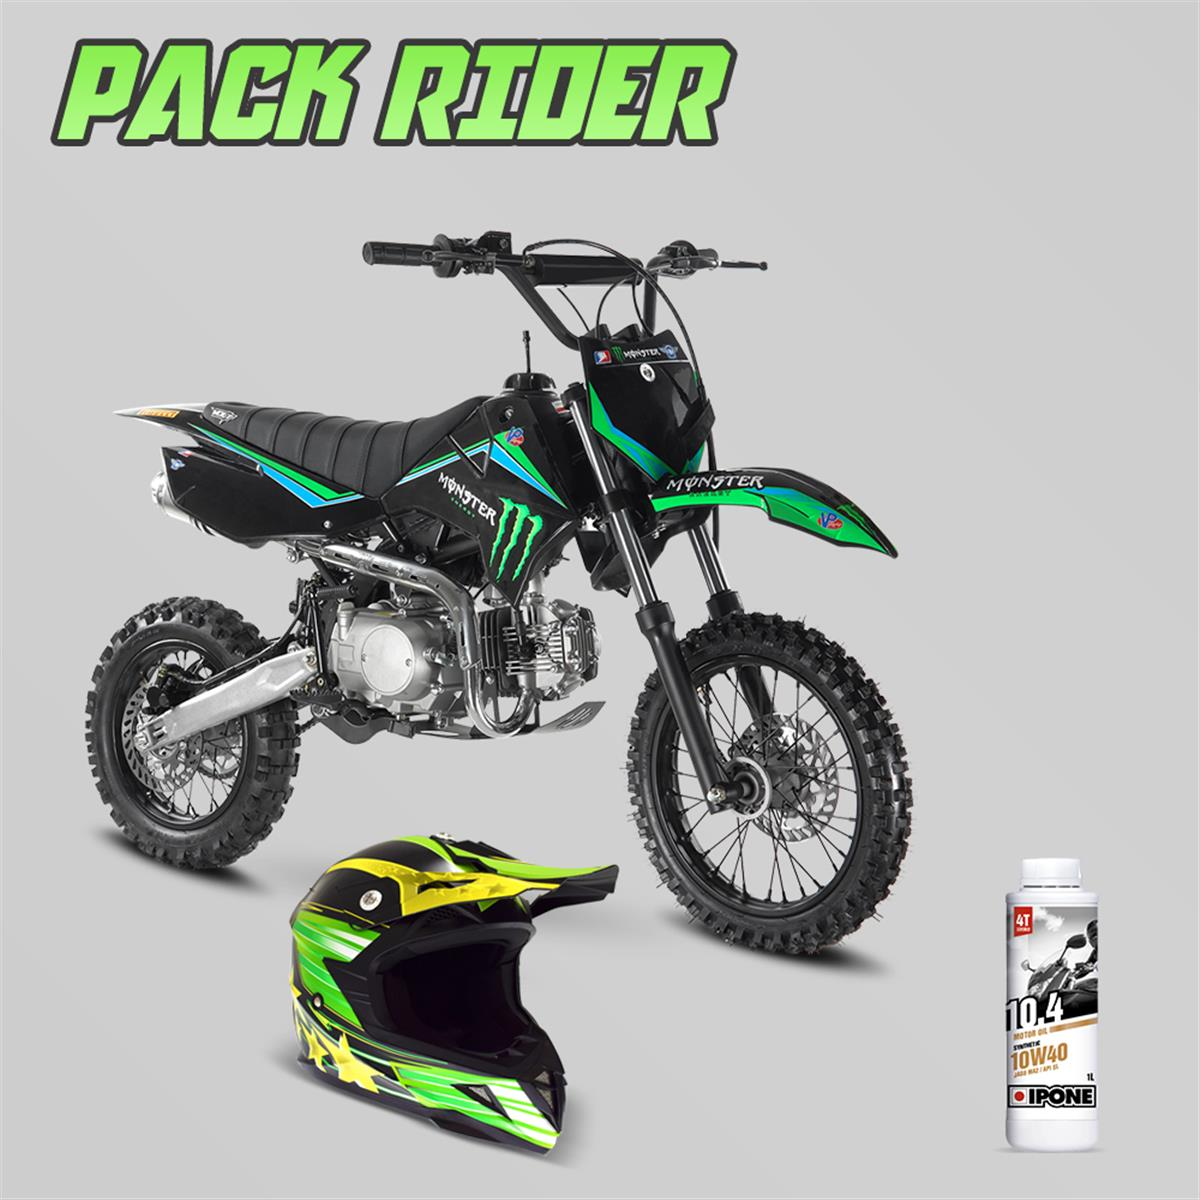 Pack Rider Dirt Bike 125cc Lx Casque Cross Huile 10w40 Smallmx